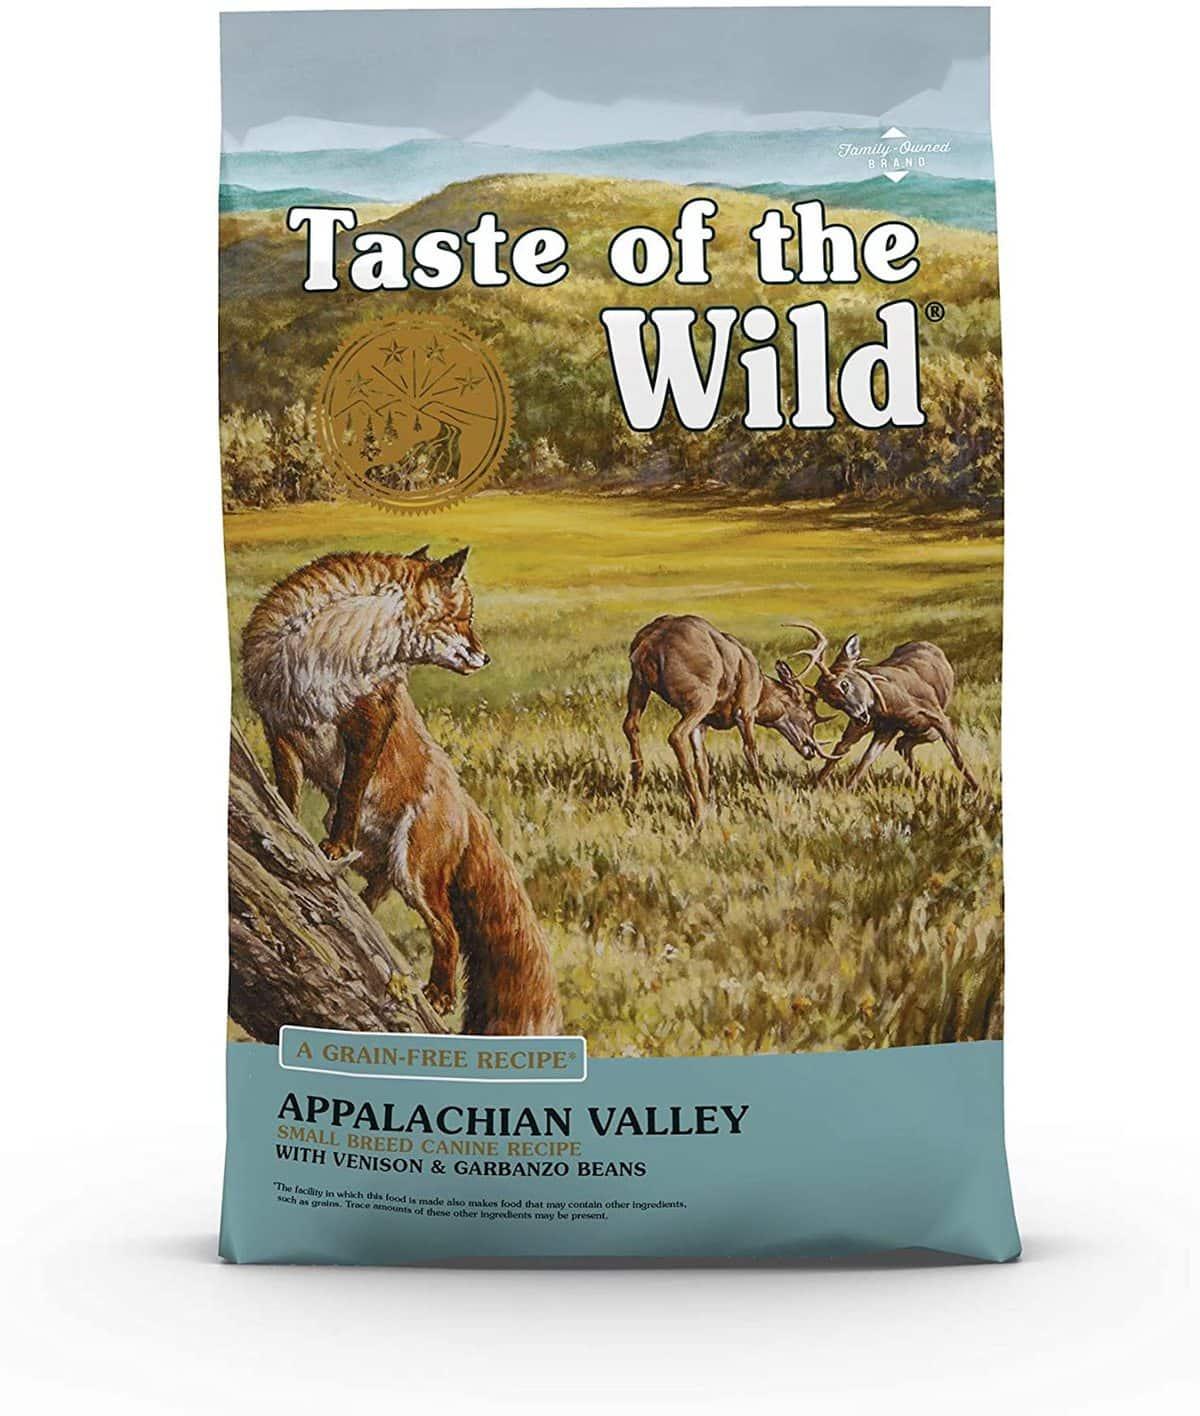 Taste of the Wild Appalachian Flavor Small Breed Dog Food